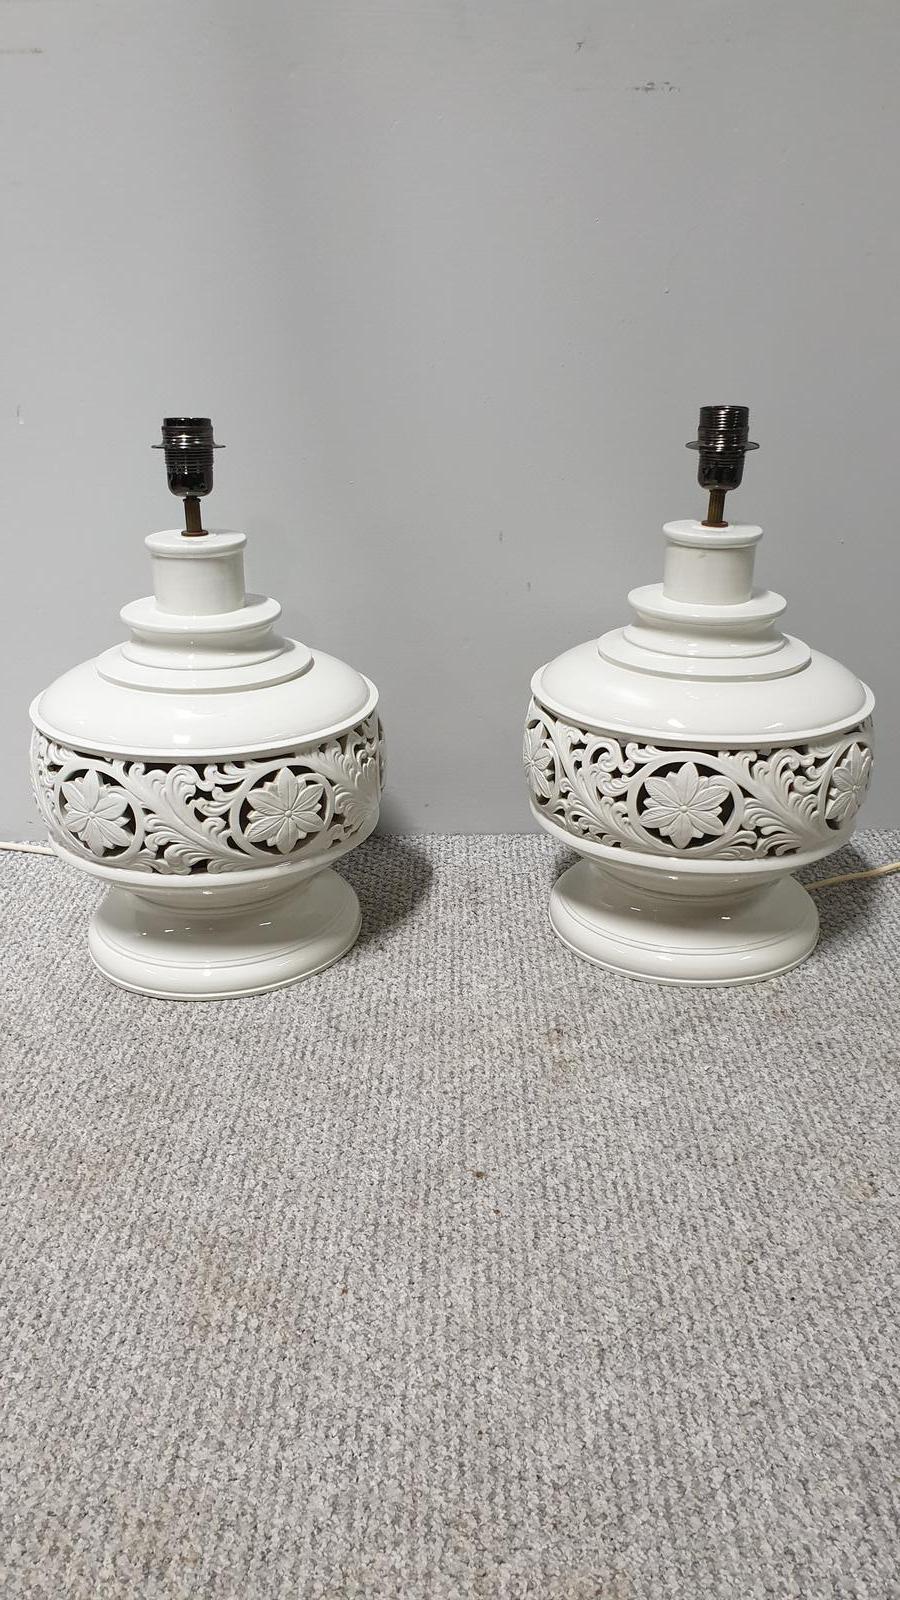 Pair of Large Italian Lamps (1 of 1)